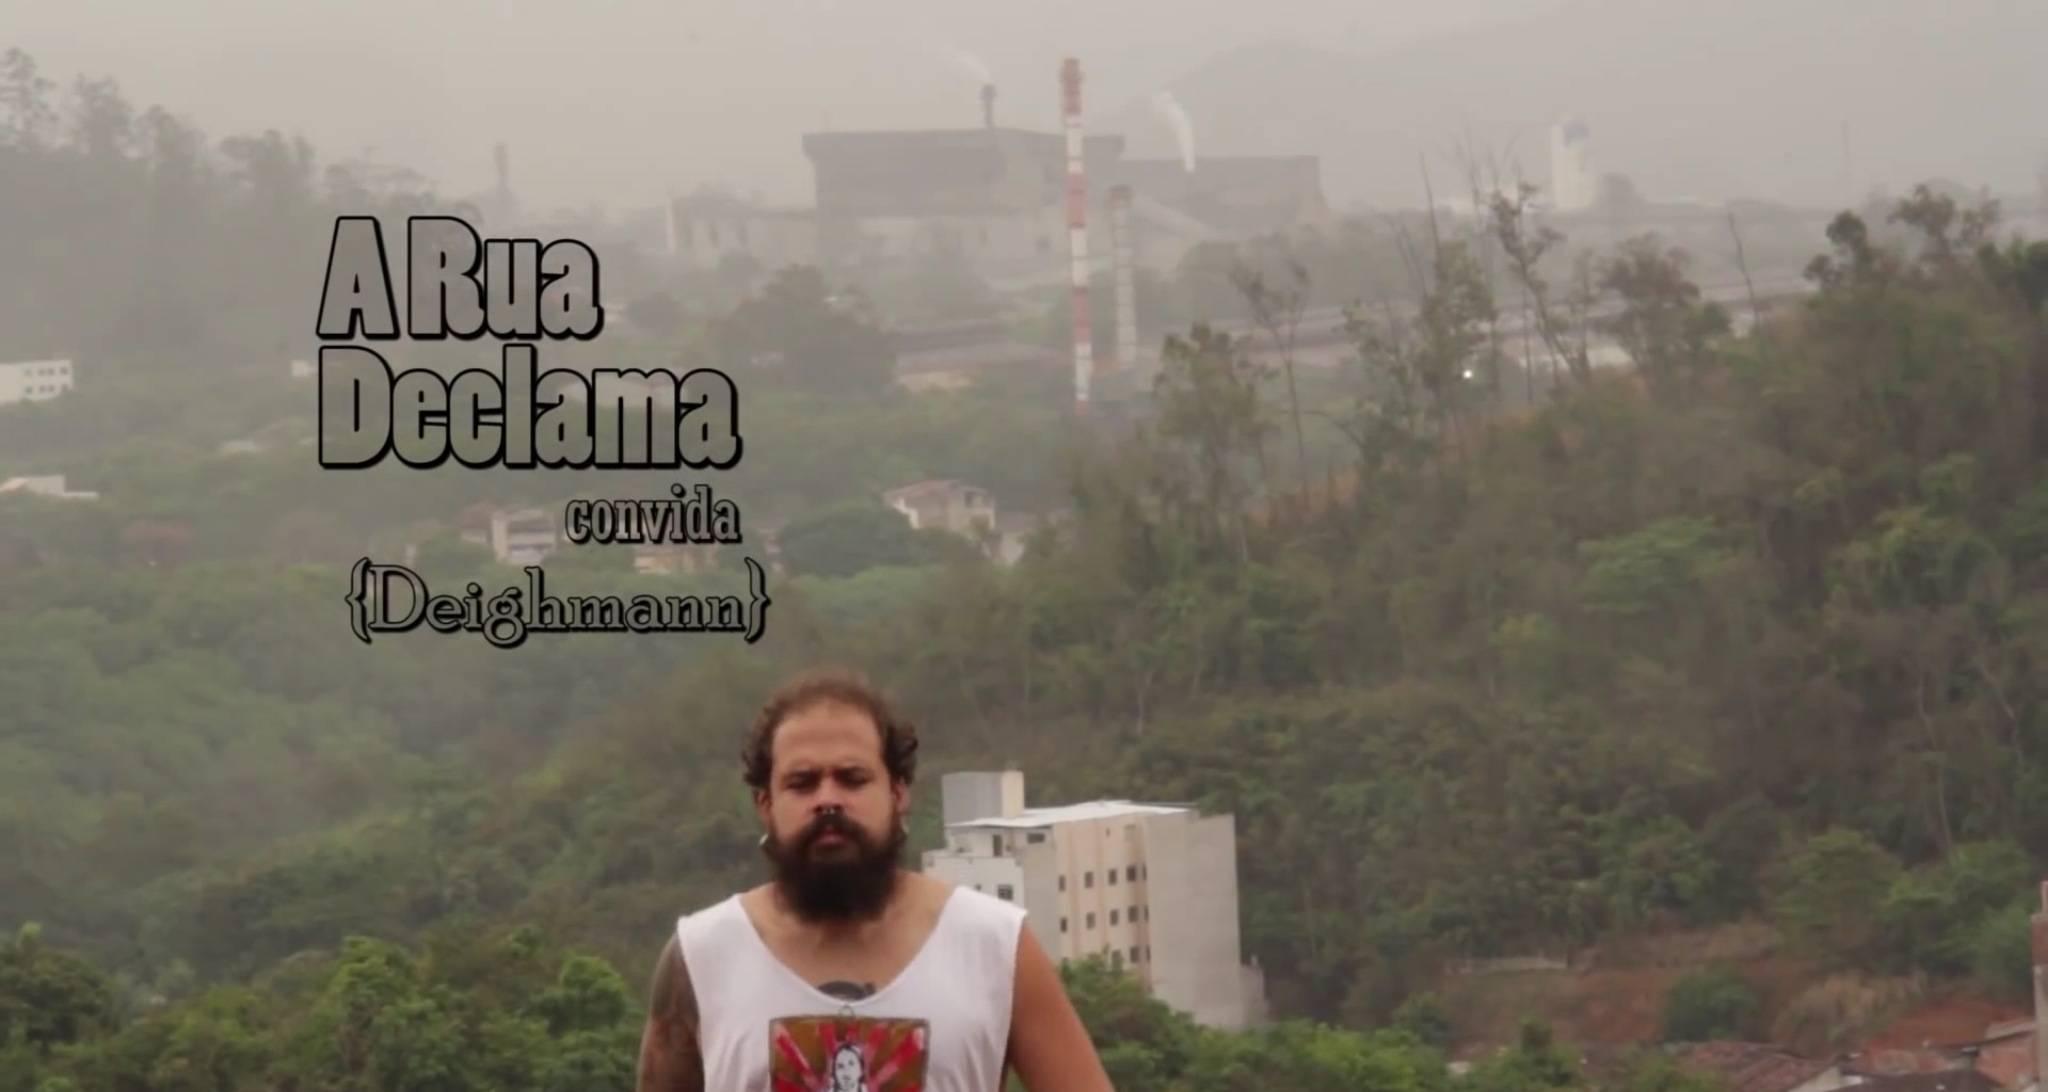 Projeto artístico de Minas Gerais valoriza a poesia canábica